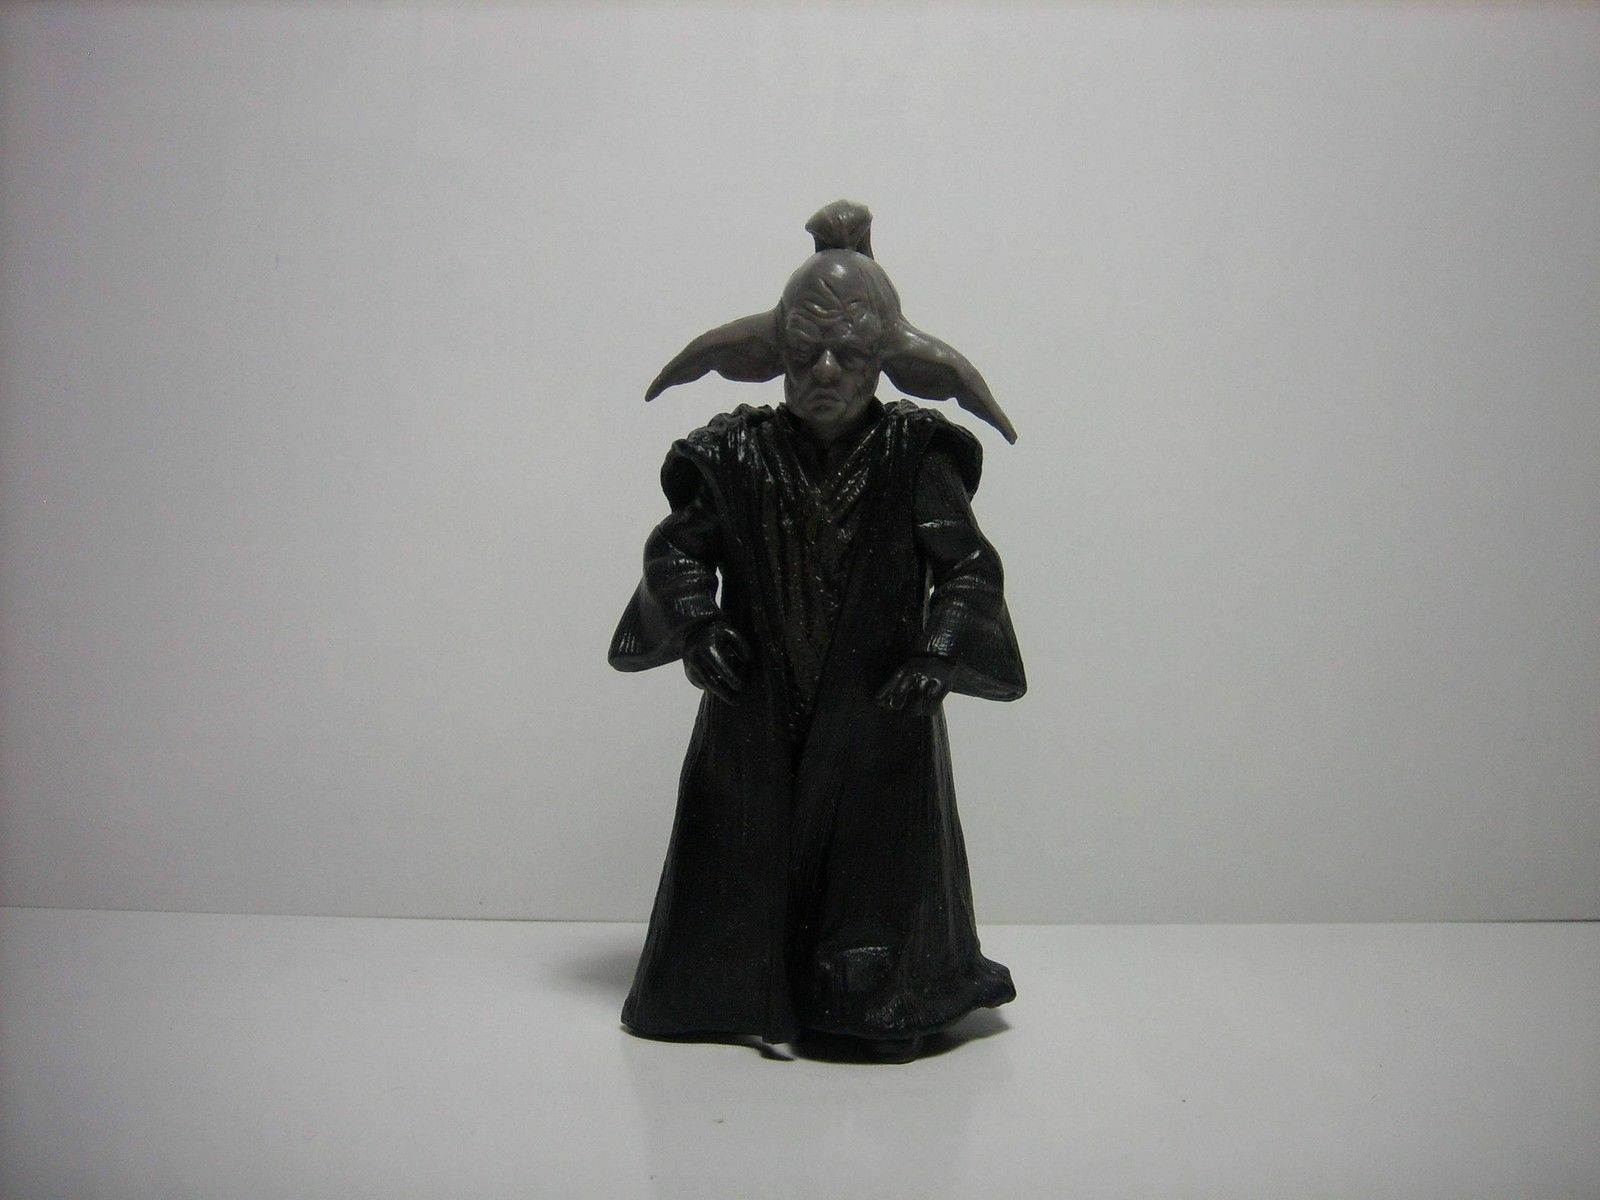 Star Wars Prototype - Even Piell - 2003 Saga AOTC Jedi High Council